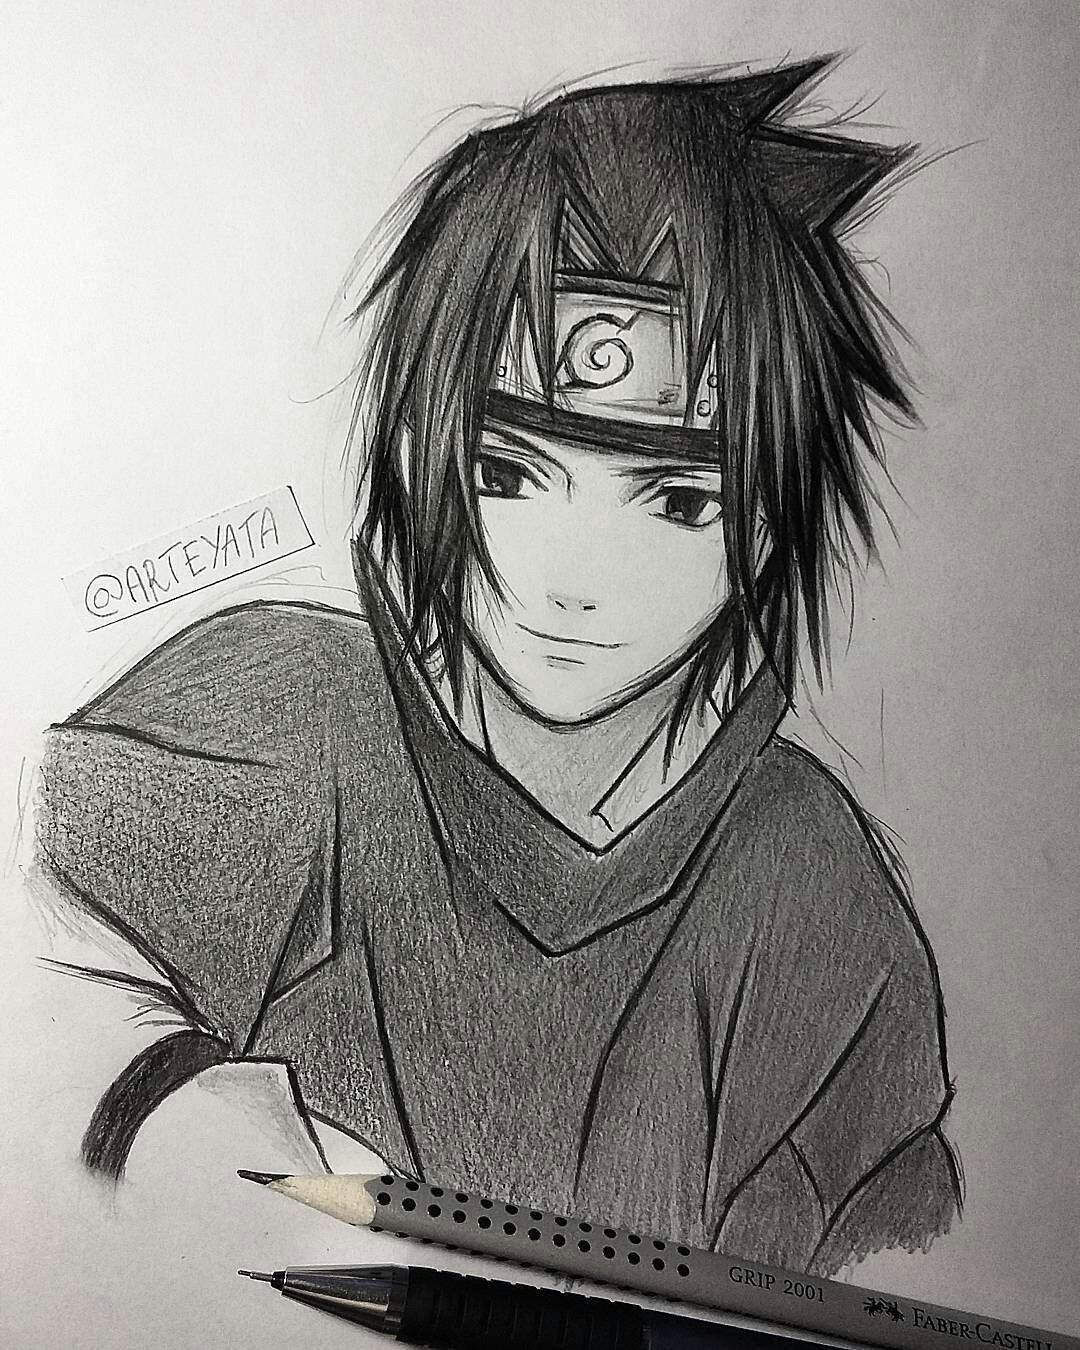 Pin By Eli On Anime With Images Naruto Sketch Sasuke Drawing